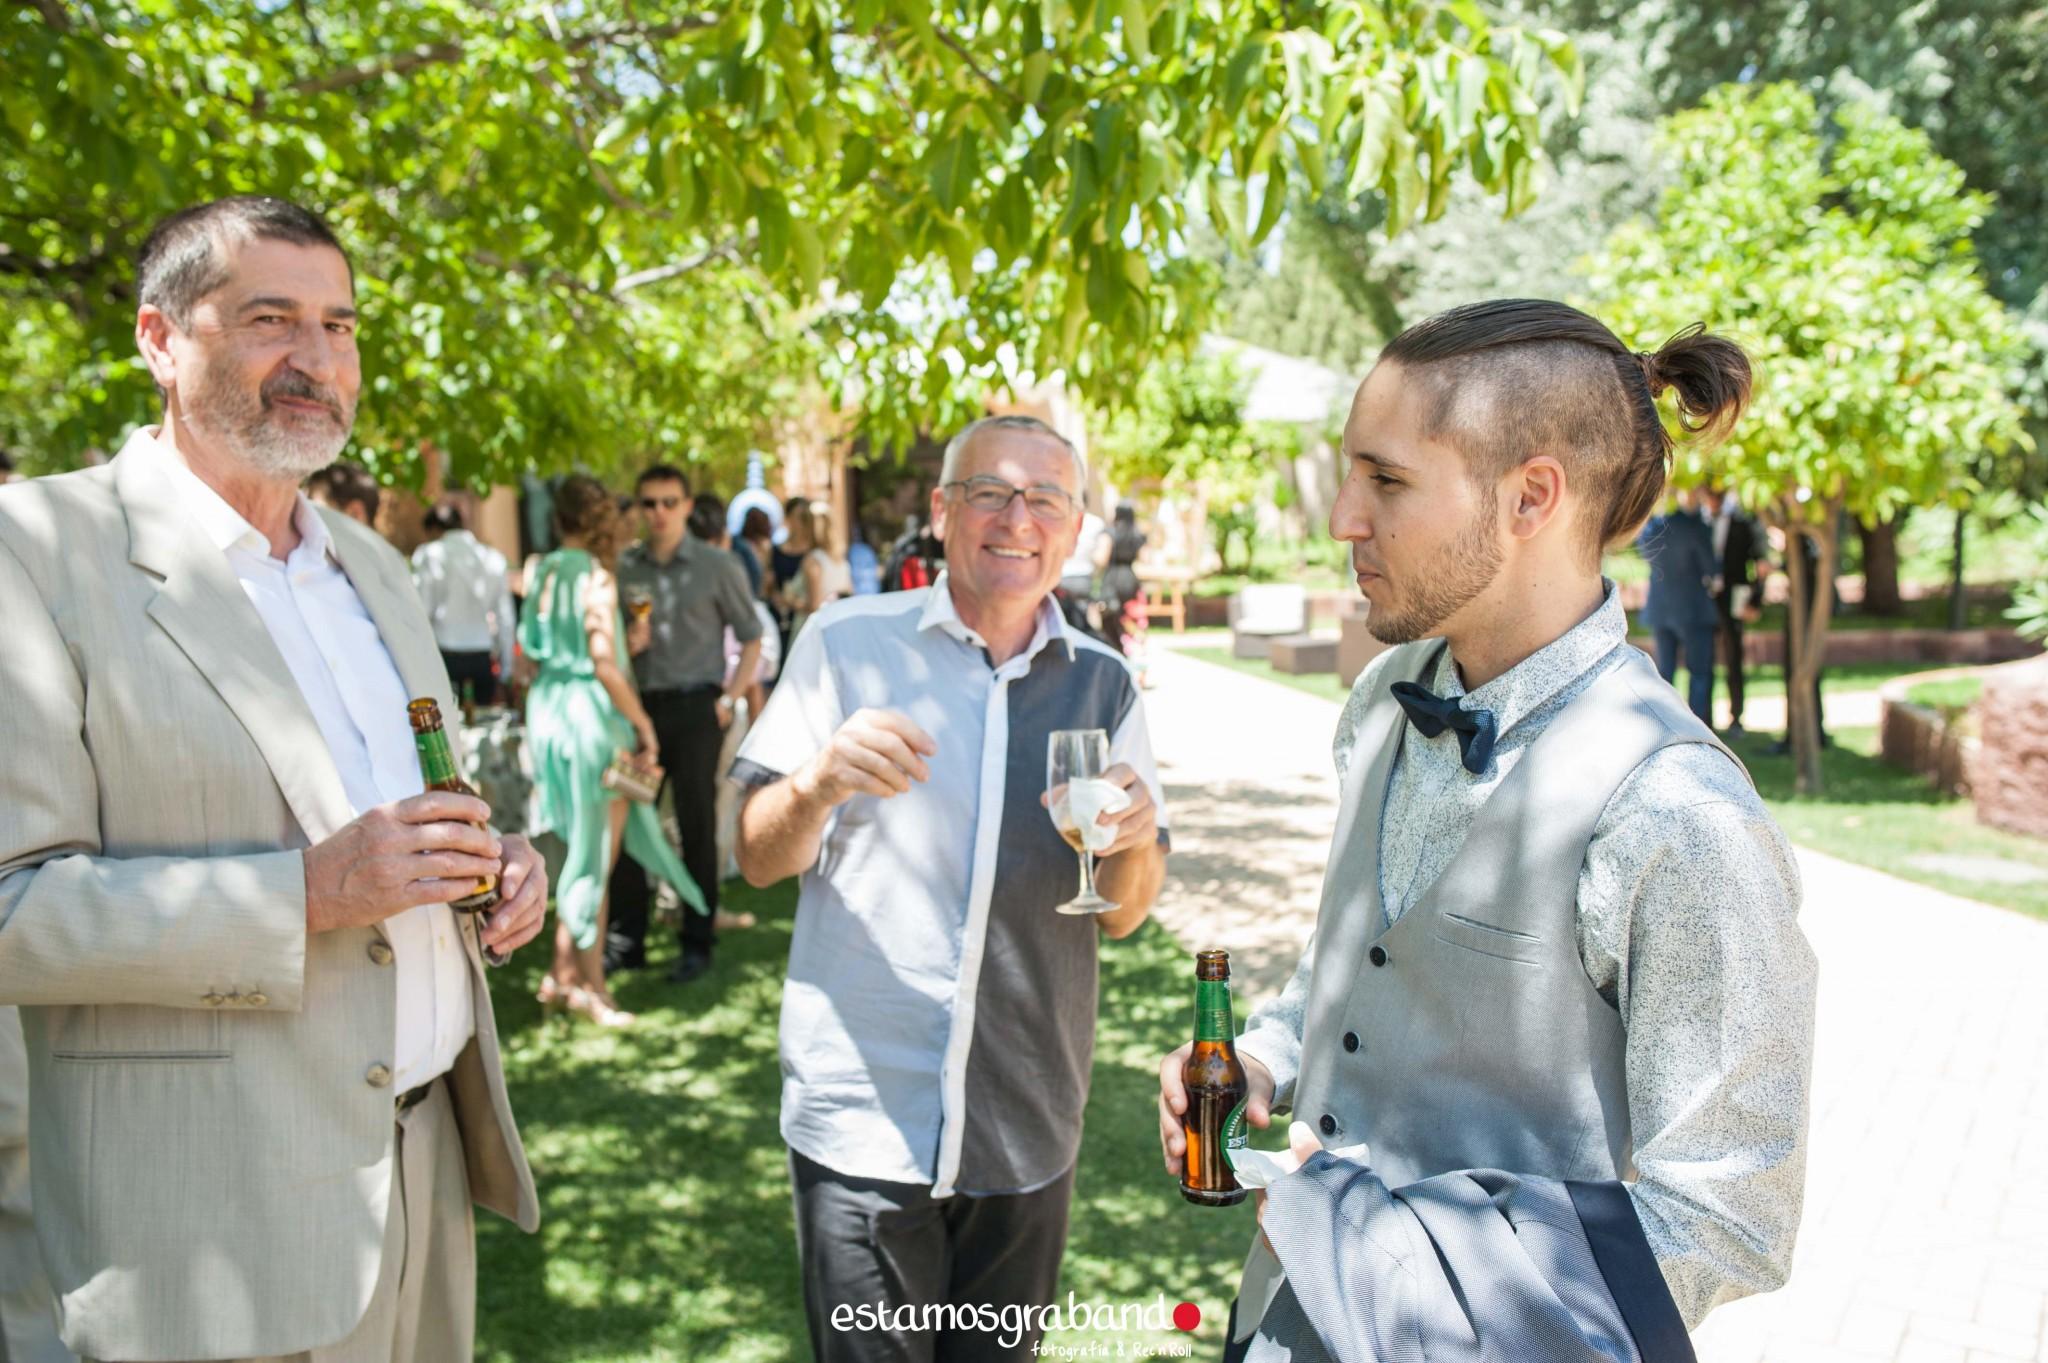 LEO-Y-PEDRO-50 Fotografía de Boda_Leo & Pedro [Jardines de la Mamunia, Granada] - video boda cadiz